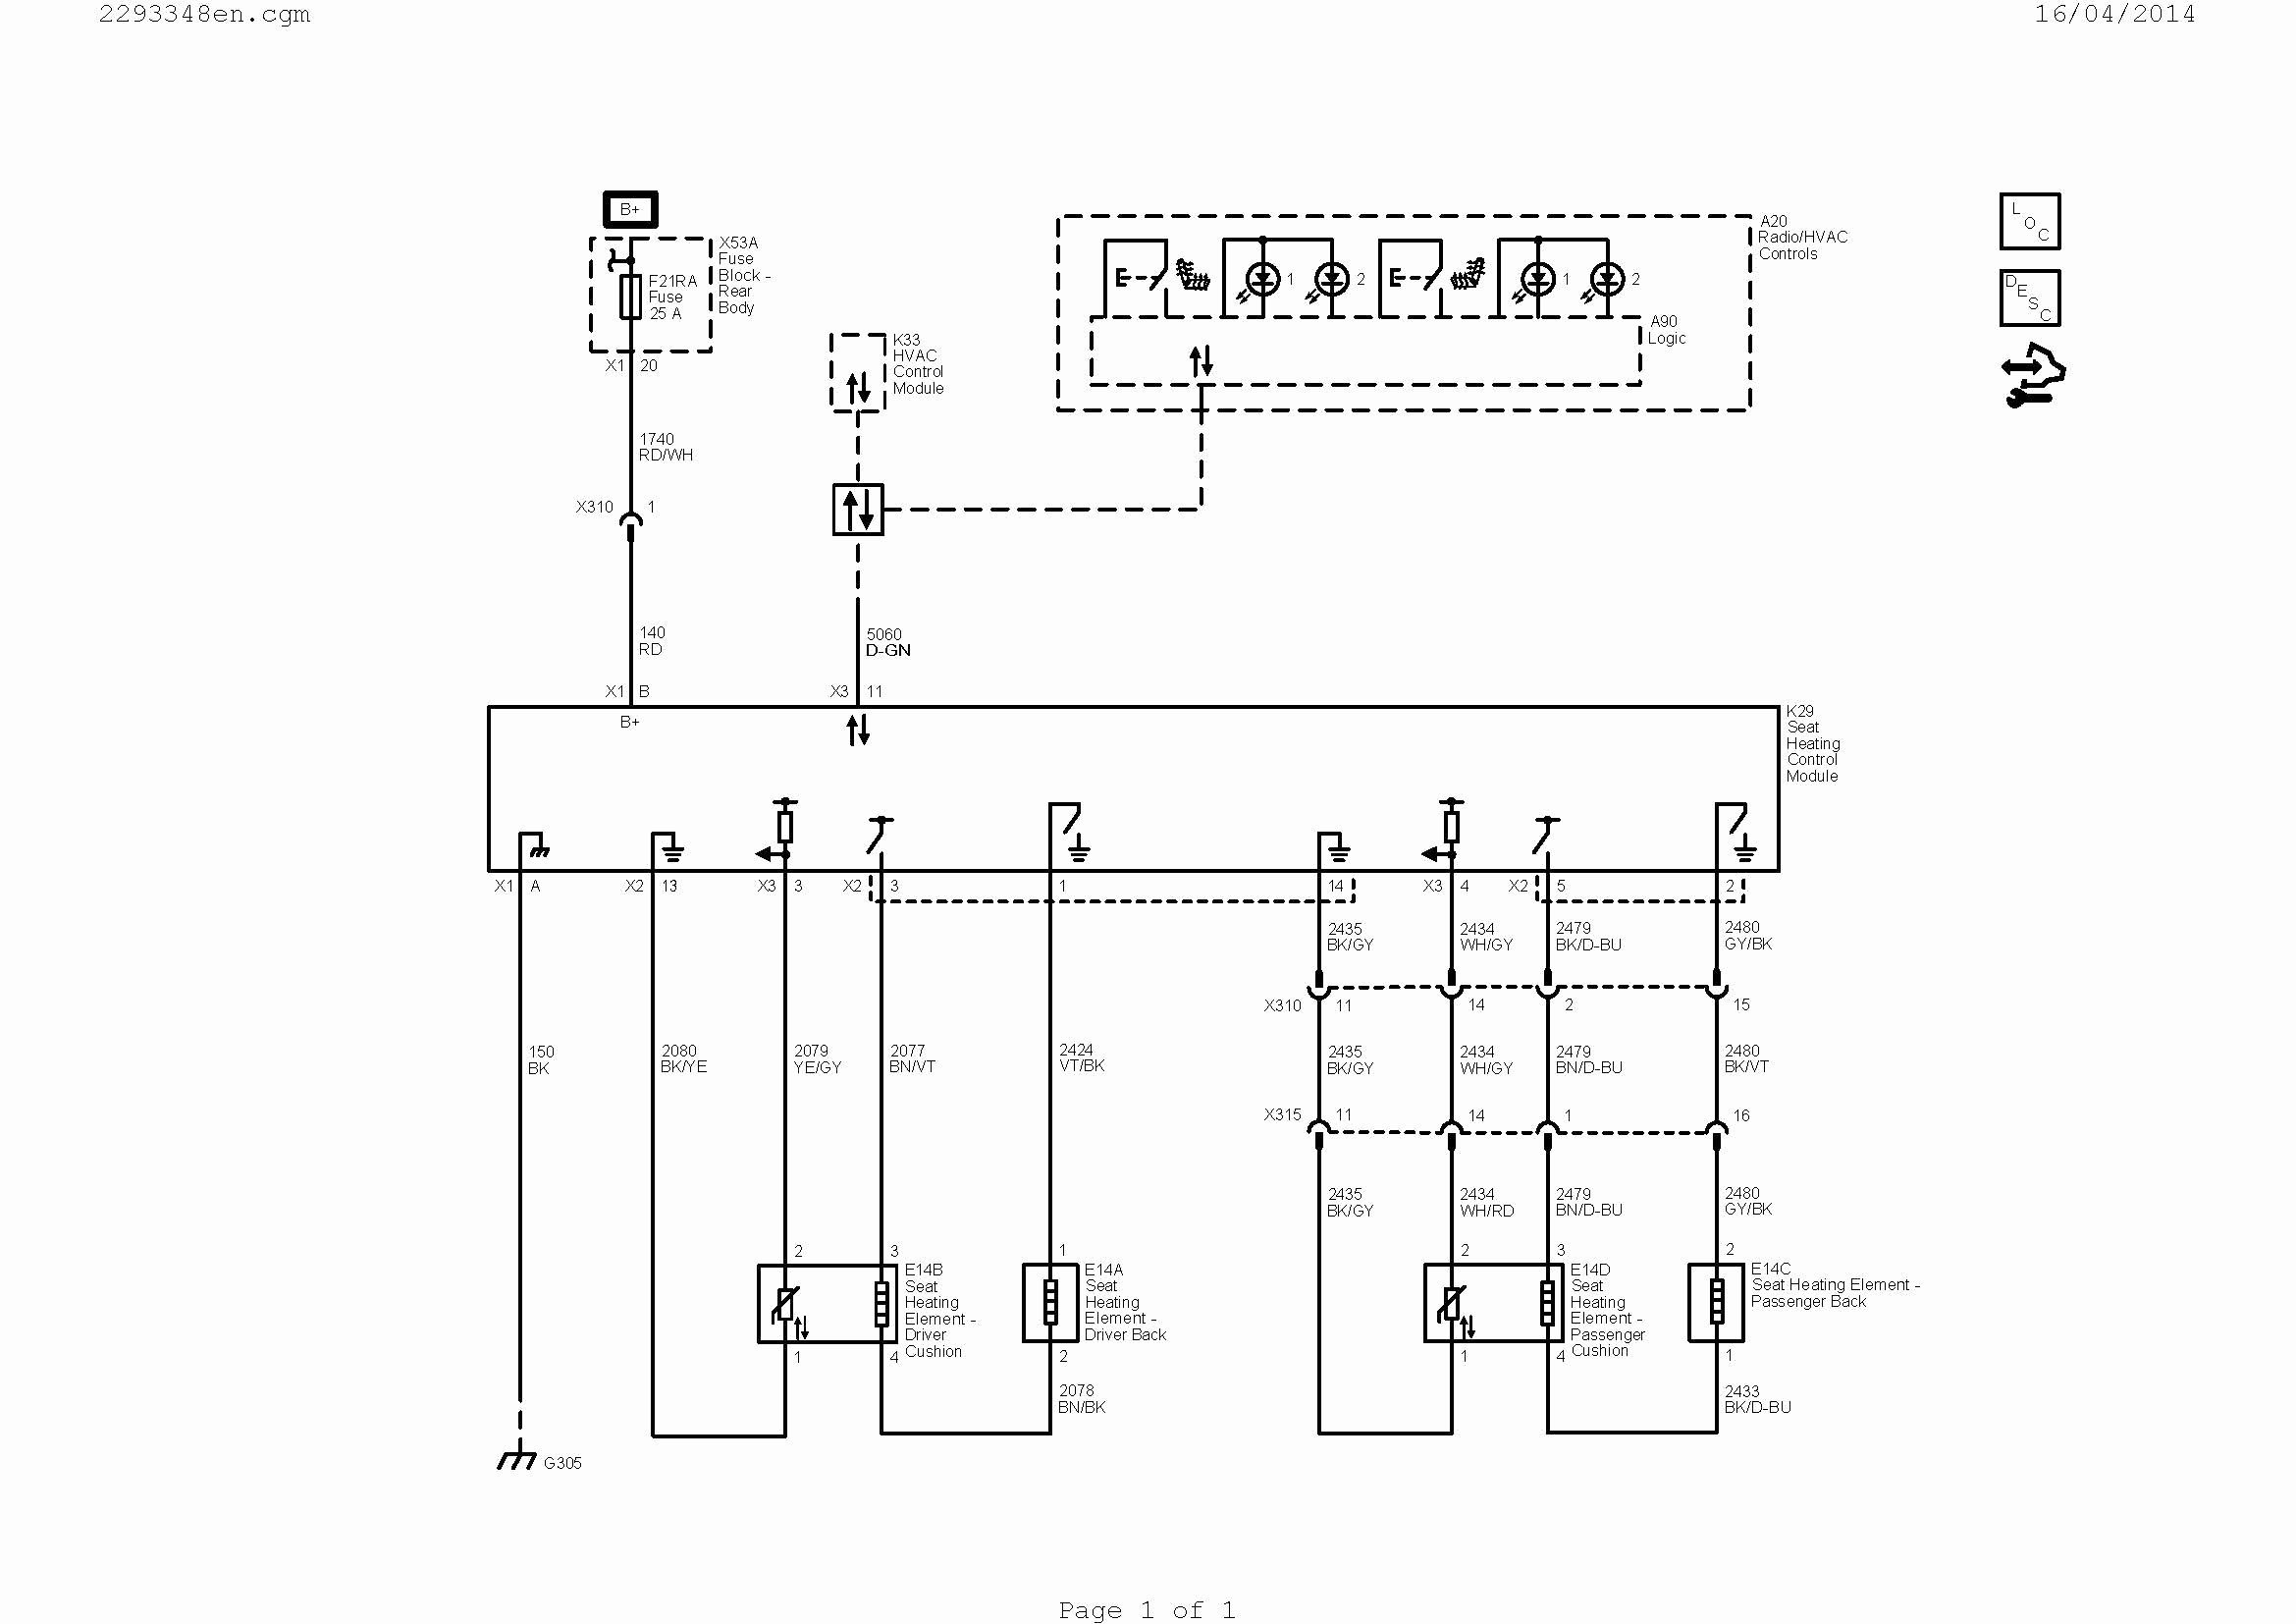 Single Phase Acme Transformer Wiring Diagrams | Manual E-Books - Buck Boost Transformer Wiring Diagram